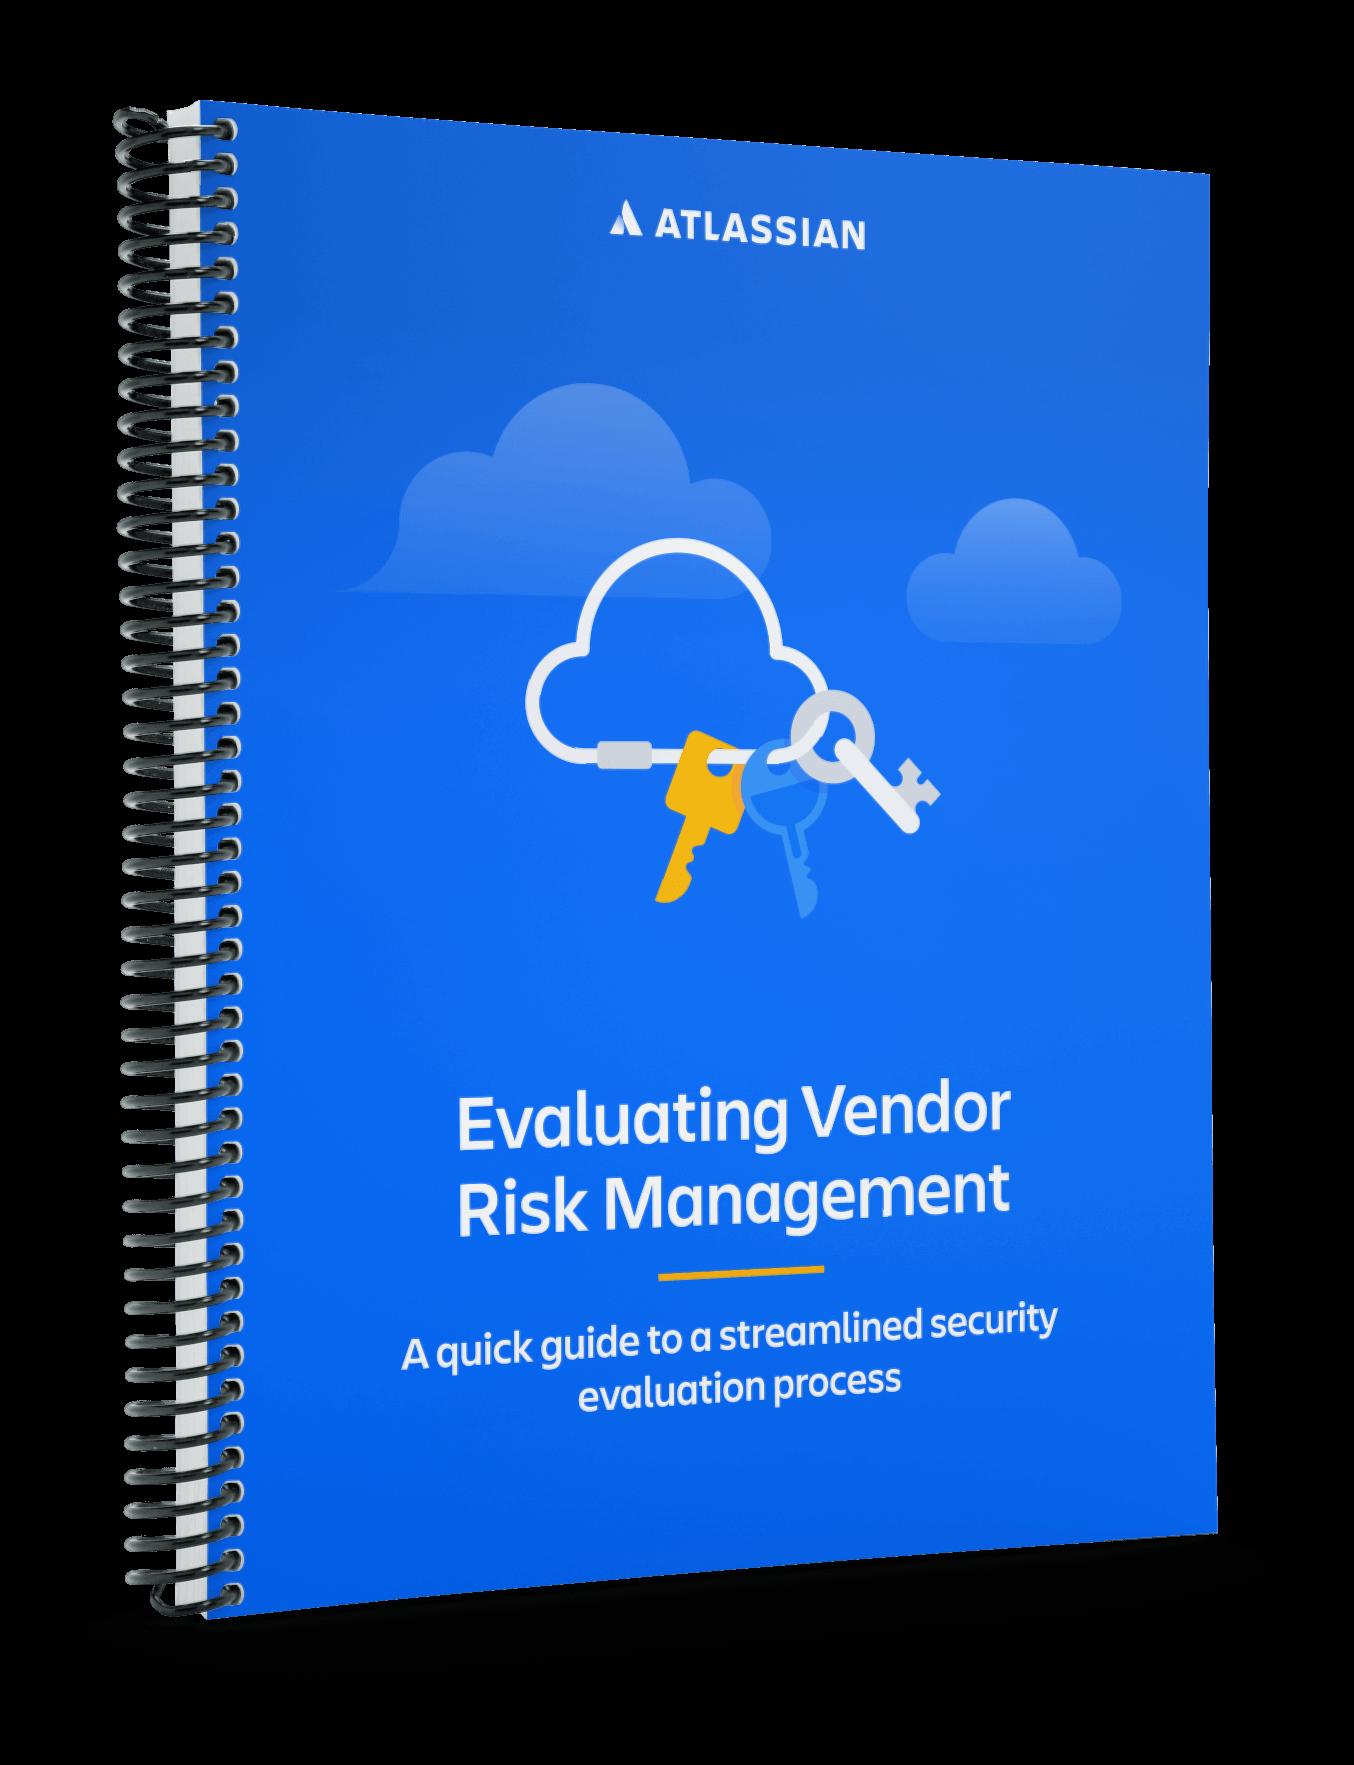 The Atlassian Guide to Evaluating Vendor Risk Management